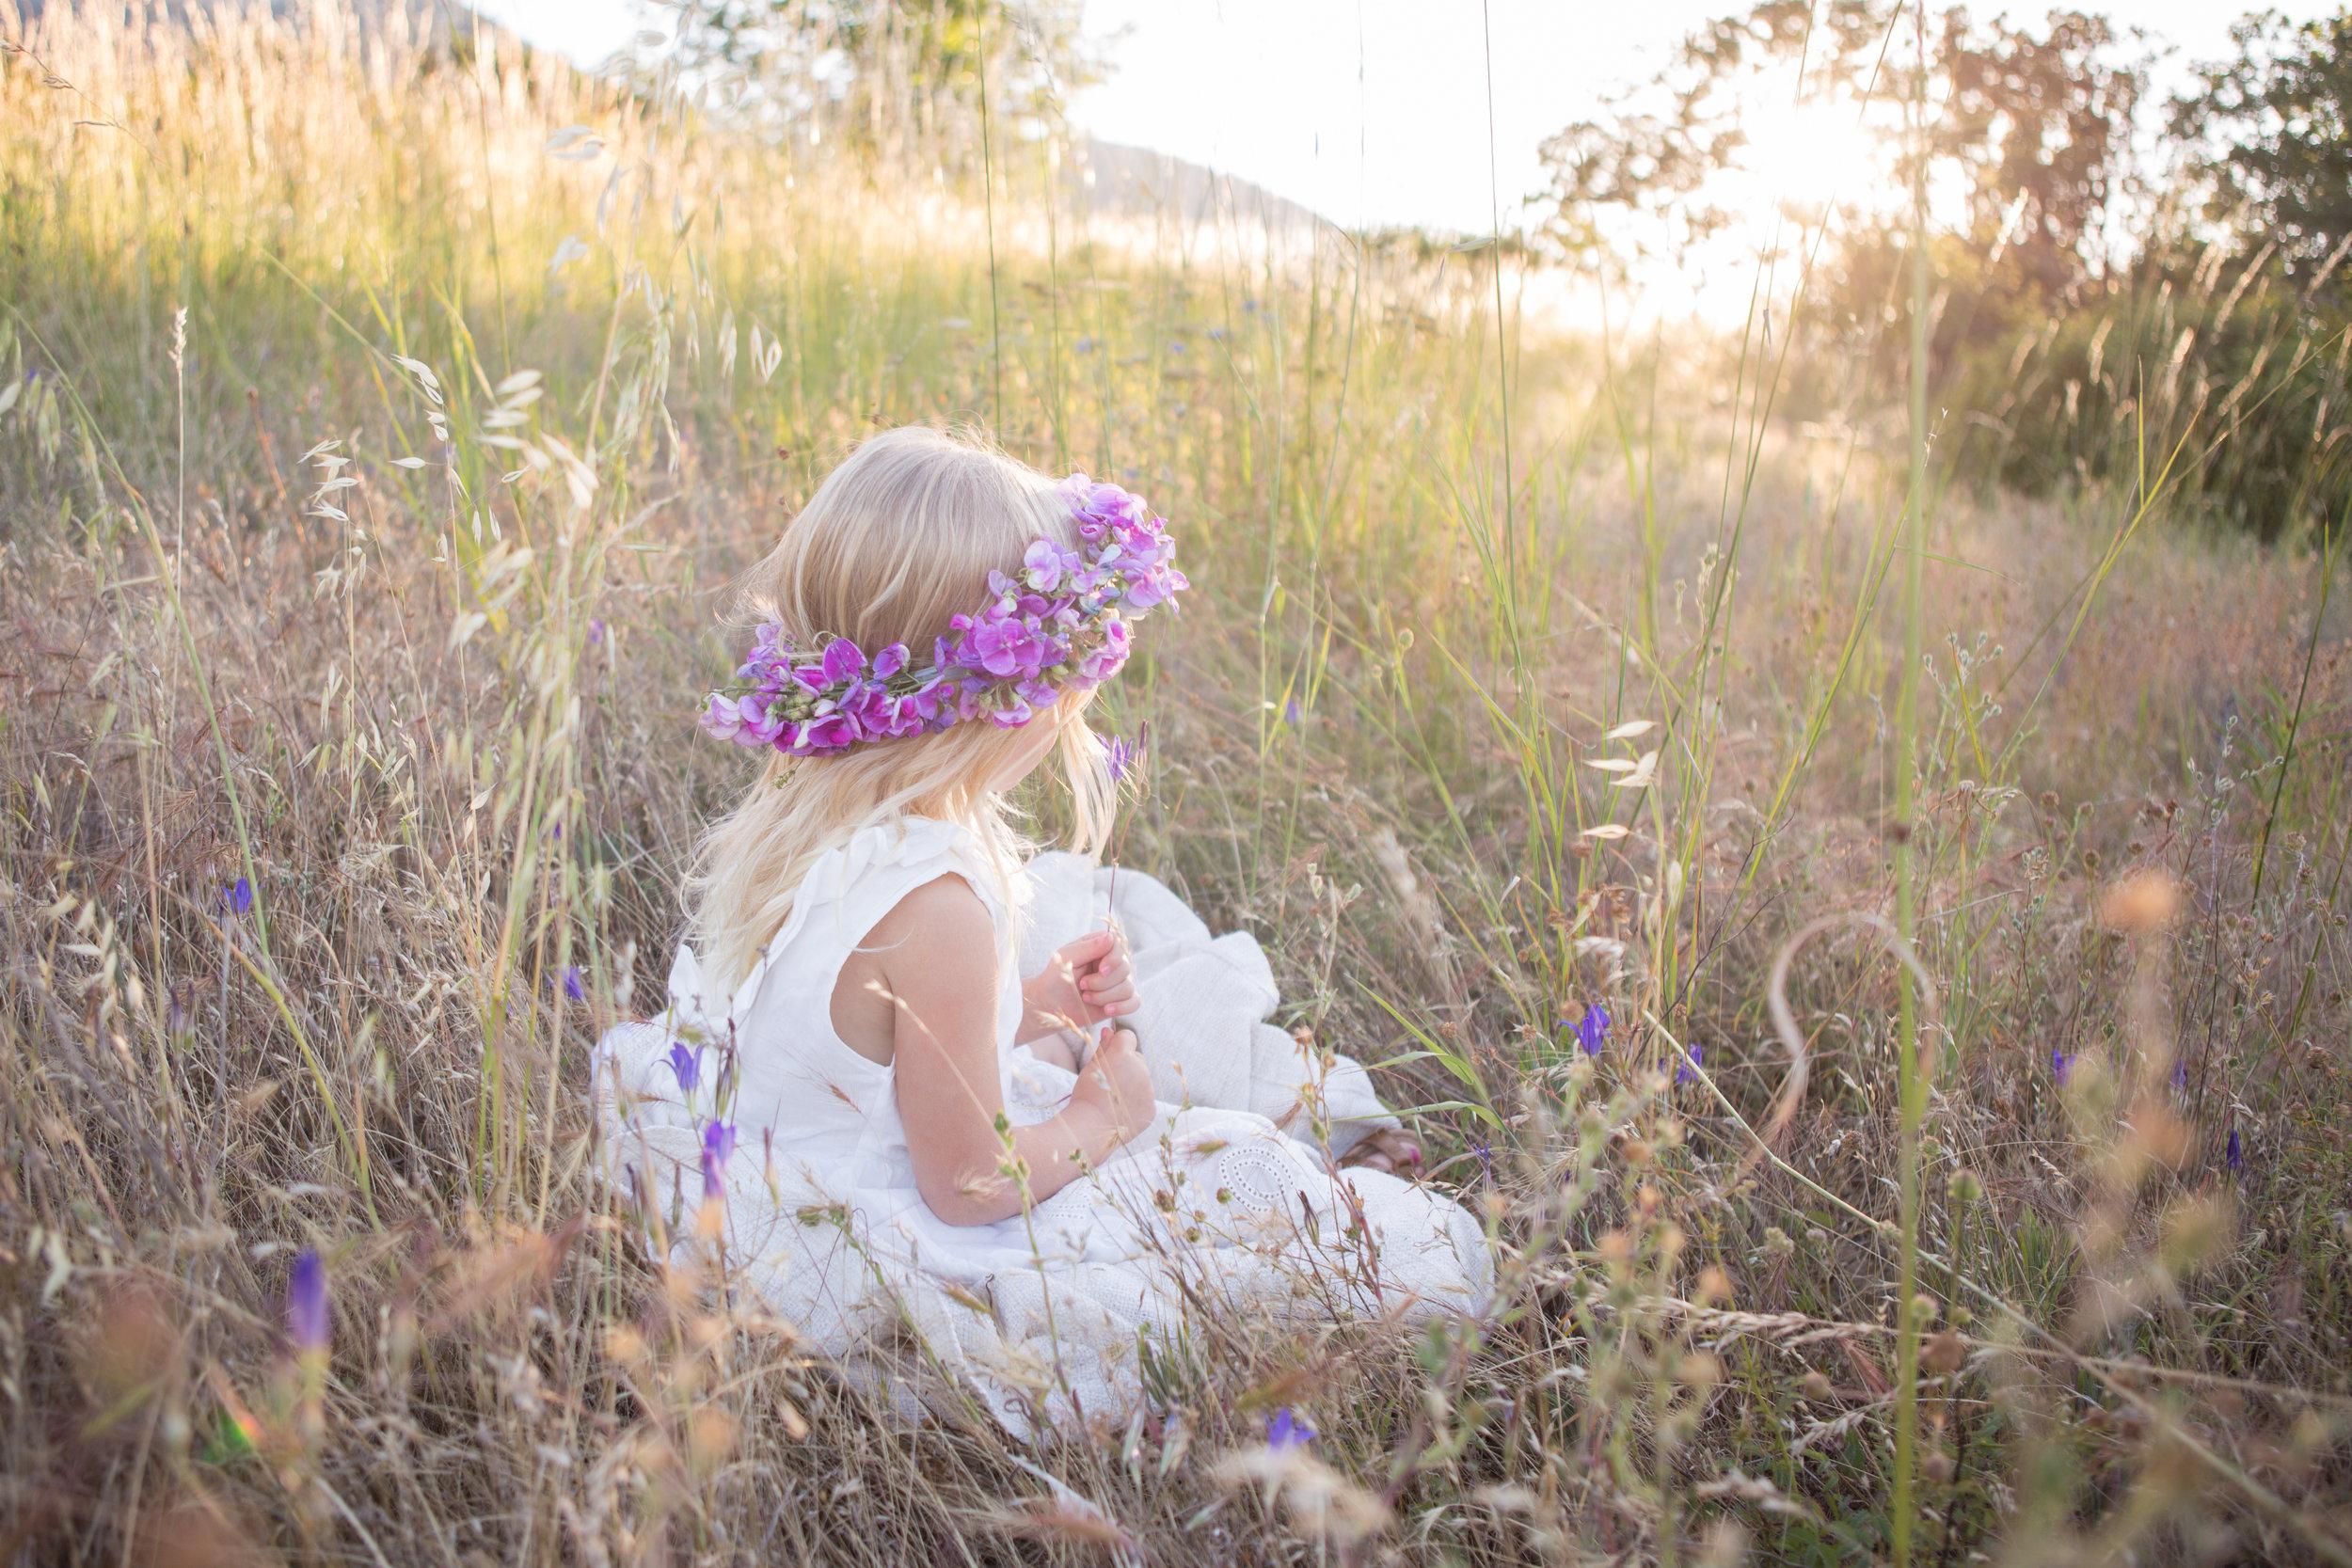 2018JuneJudah Bday-Lavender Field-Flower Crwn0125-40.jpg